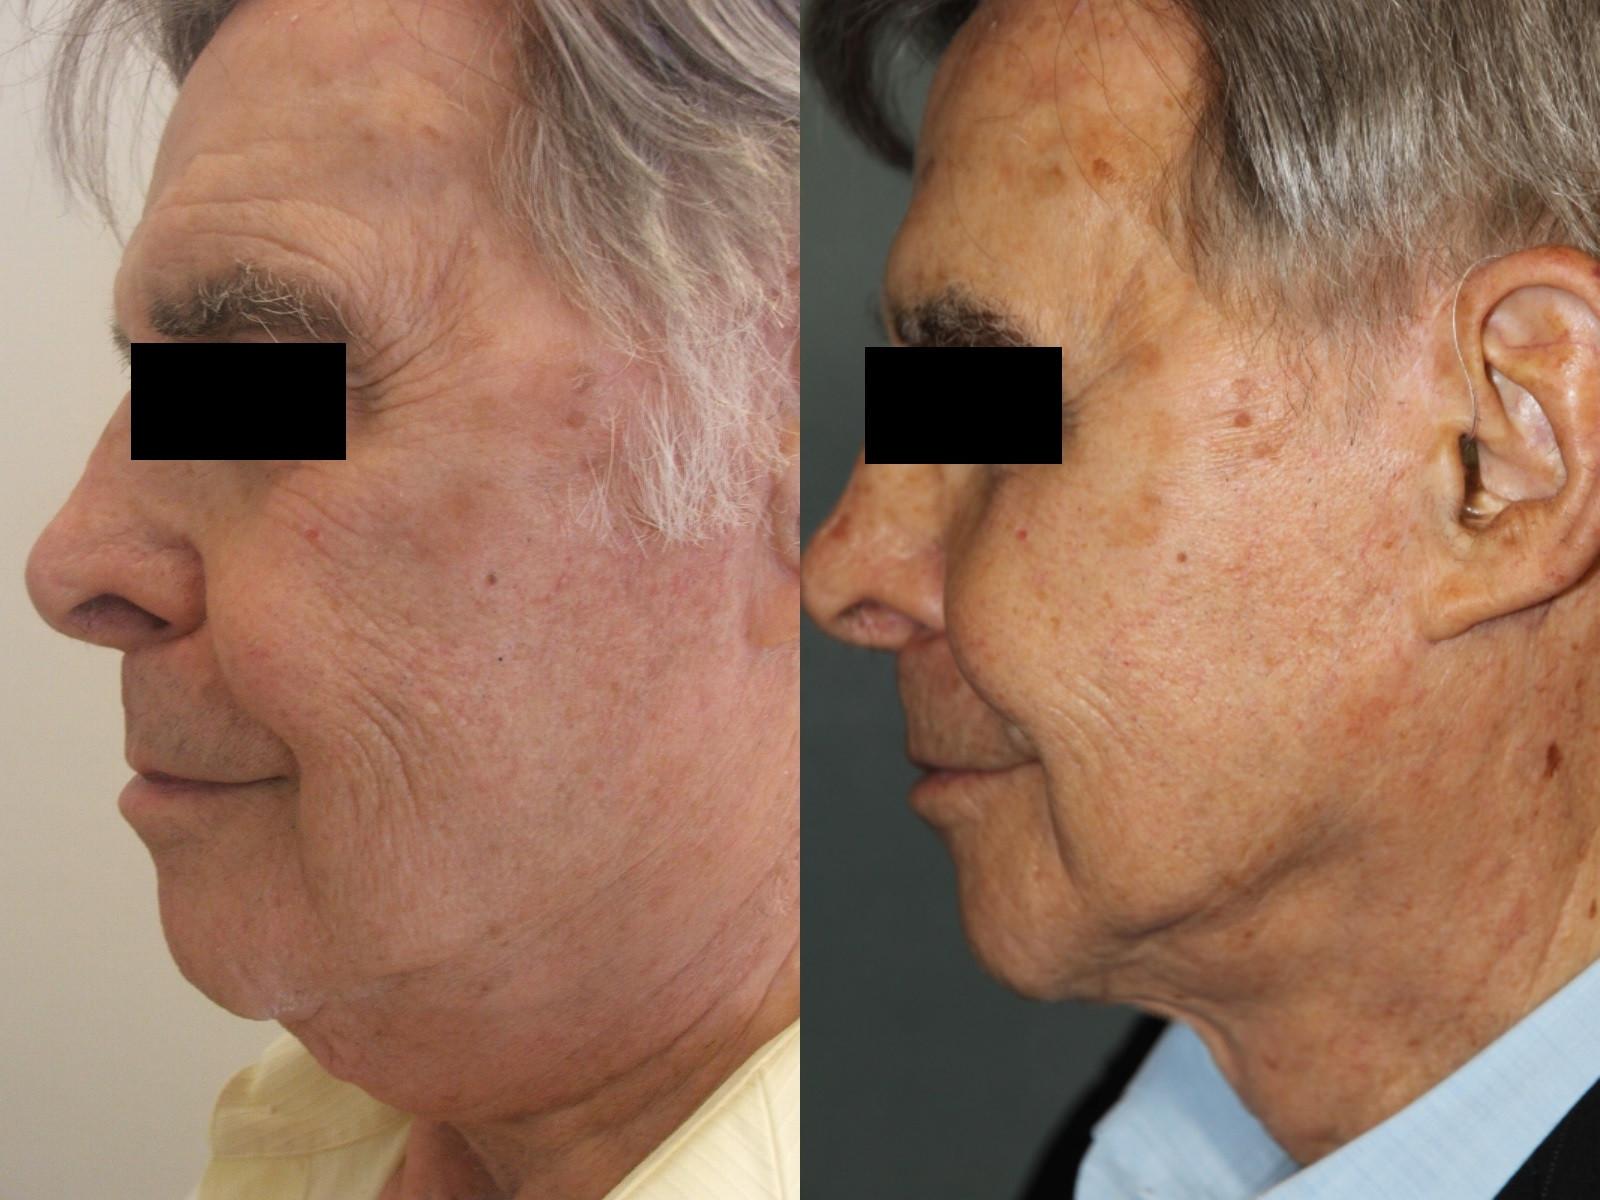 Lifting du visage ou cervico-facial homme